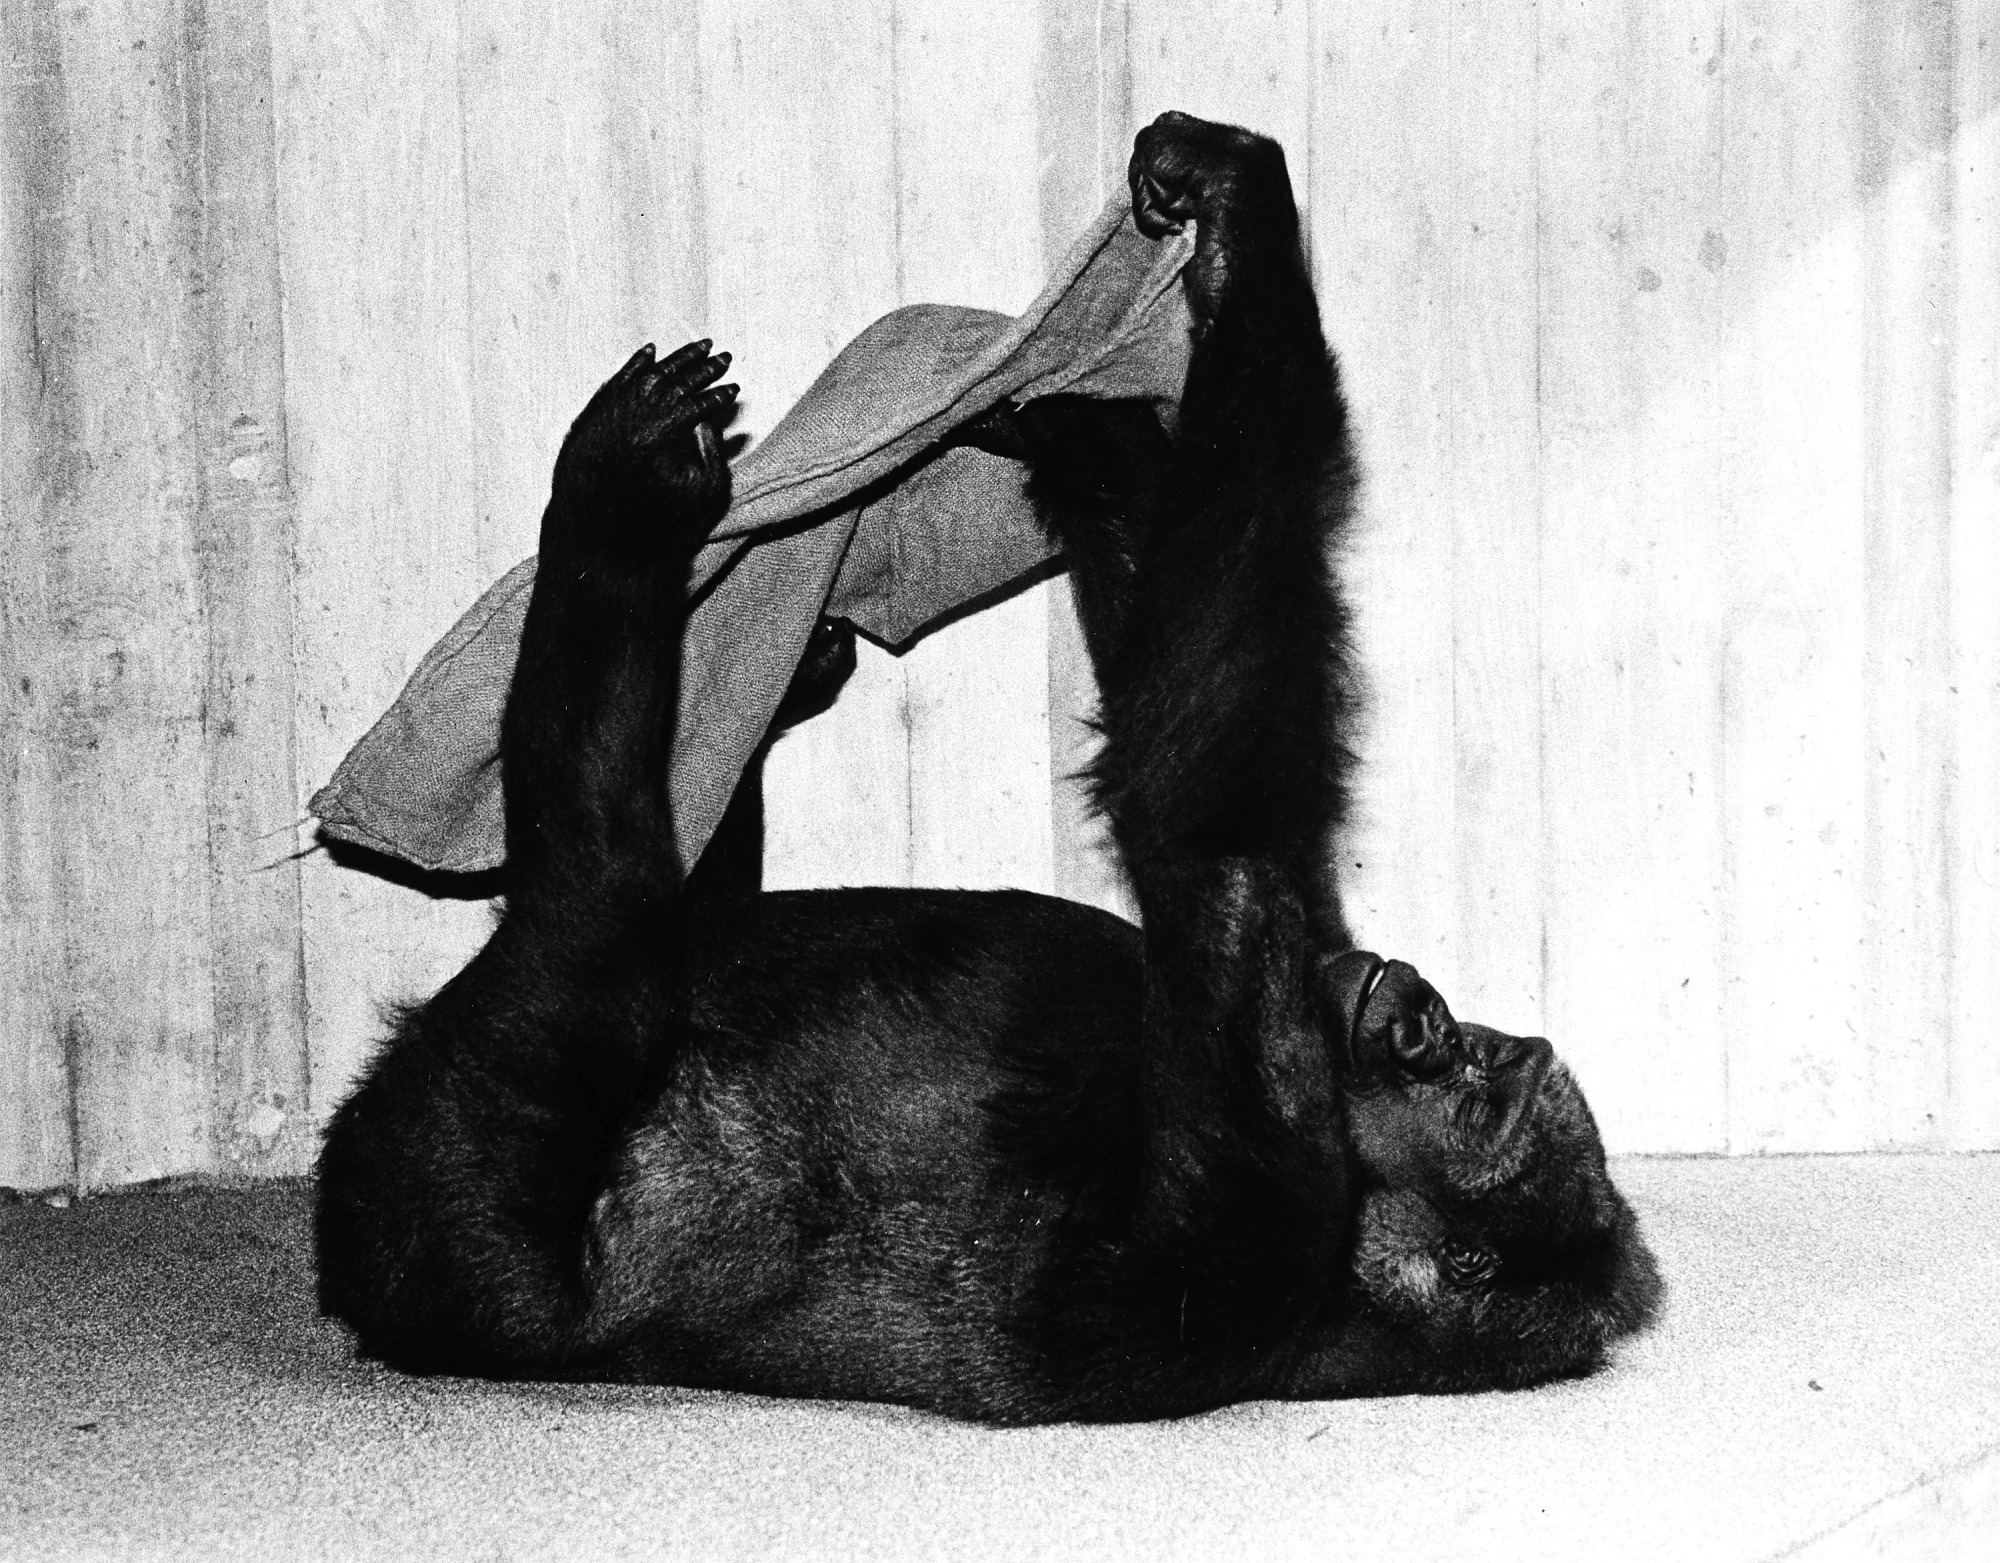 NZP Gorilla Femelle Plays with Burlap Sack